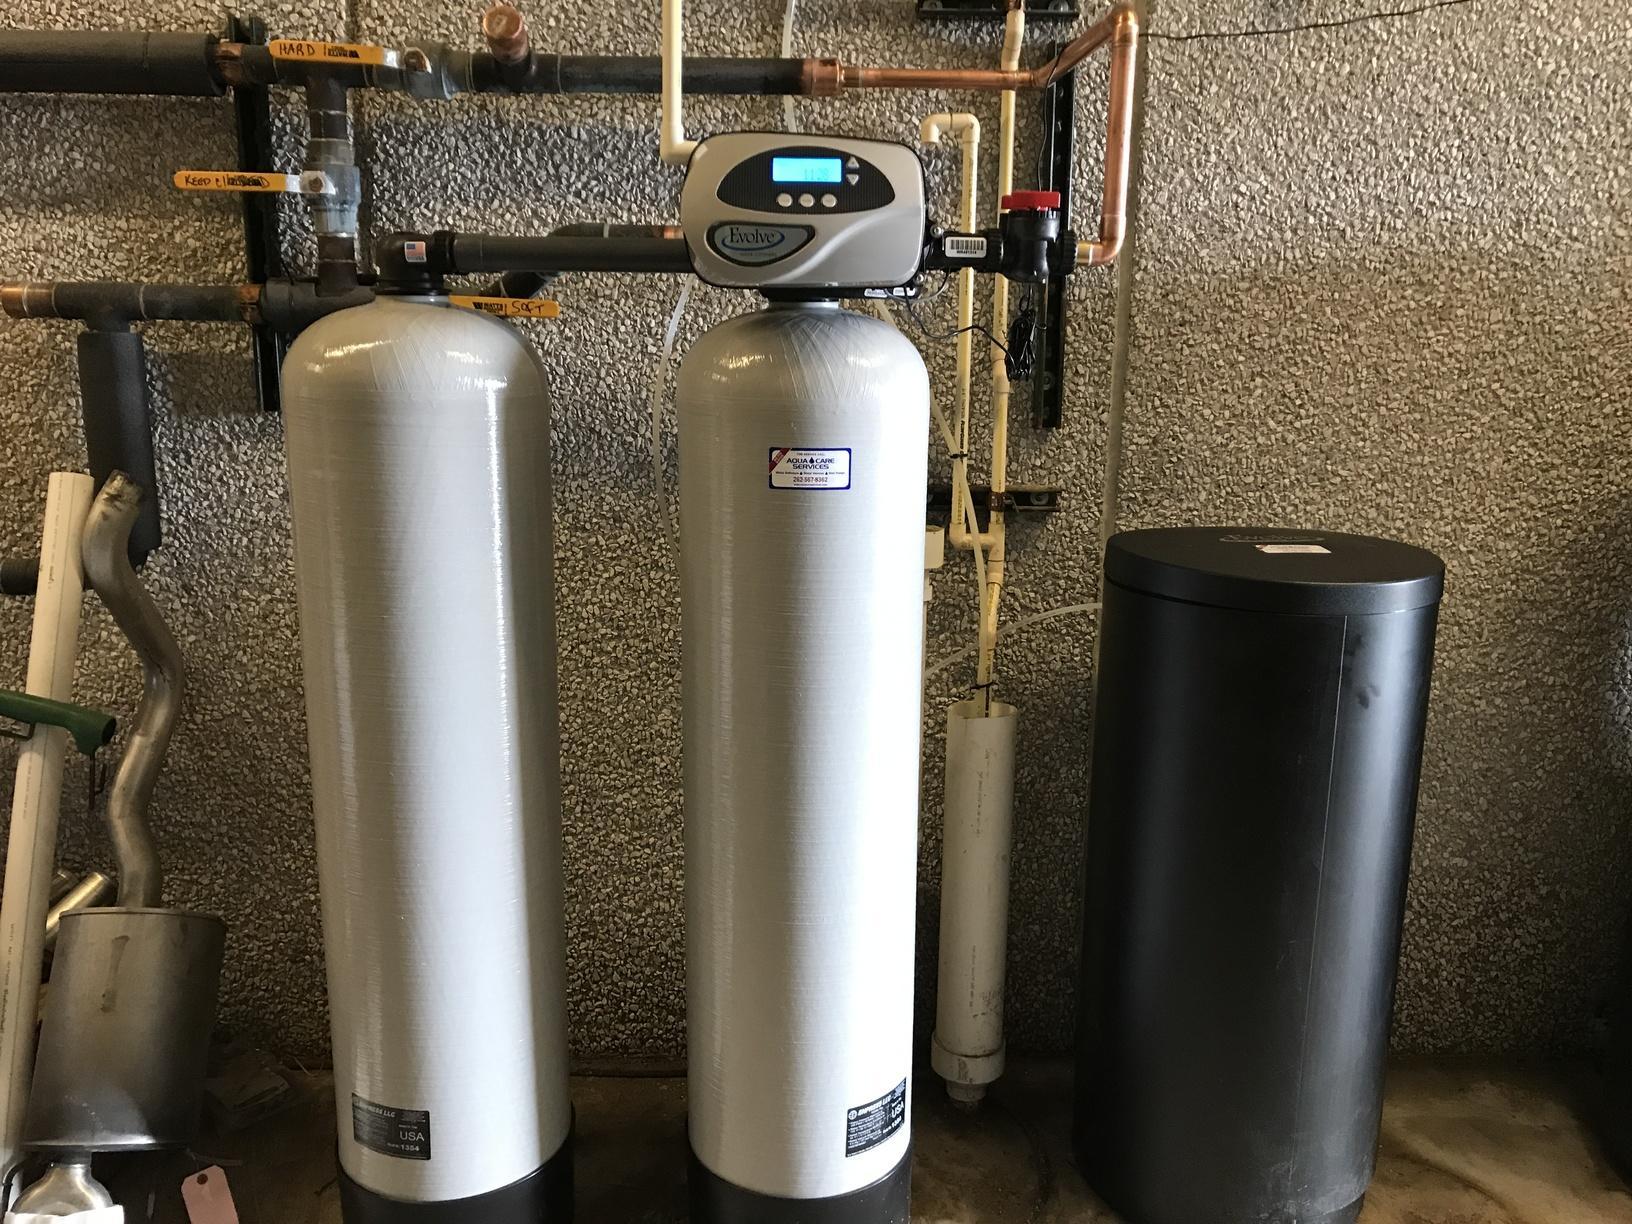 Twin Alterning Water Softener